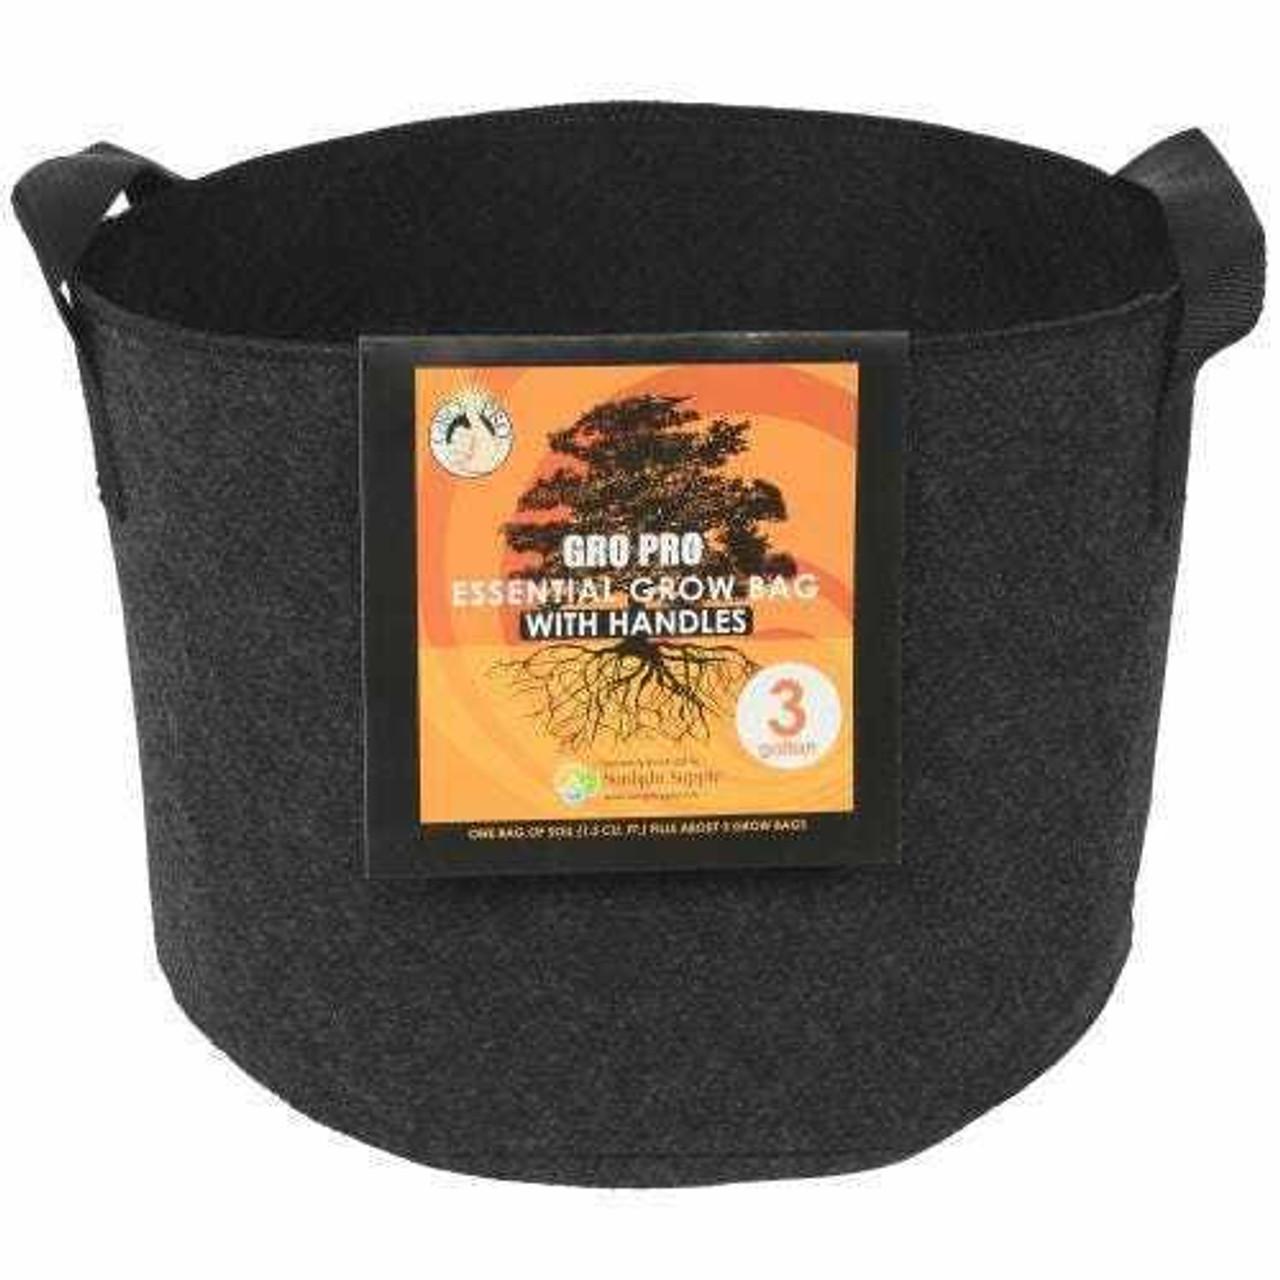 Gro Pro Essential Round Fabric Pot w/ Handles 3 Gallon - Black - 1